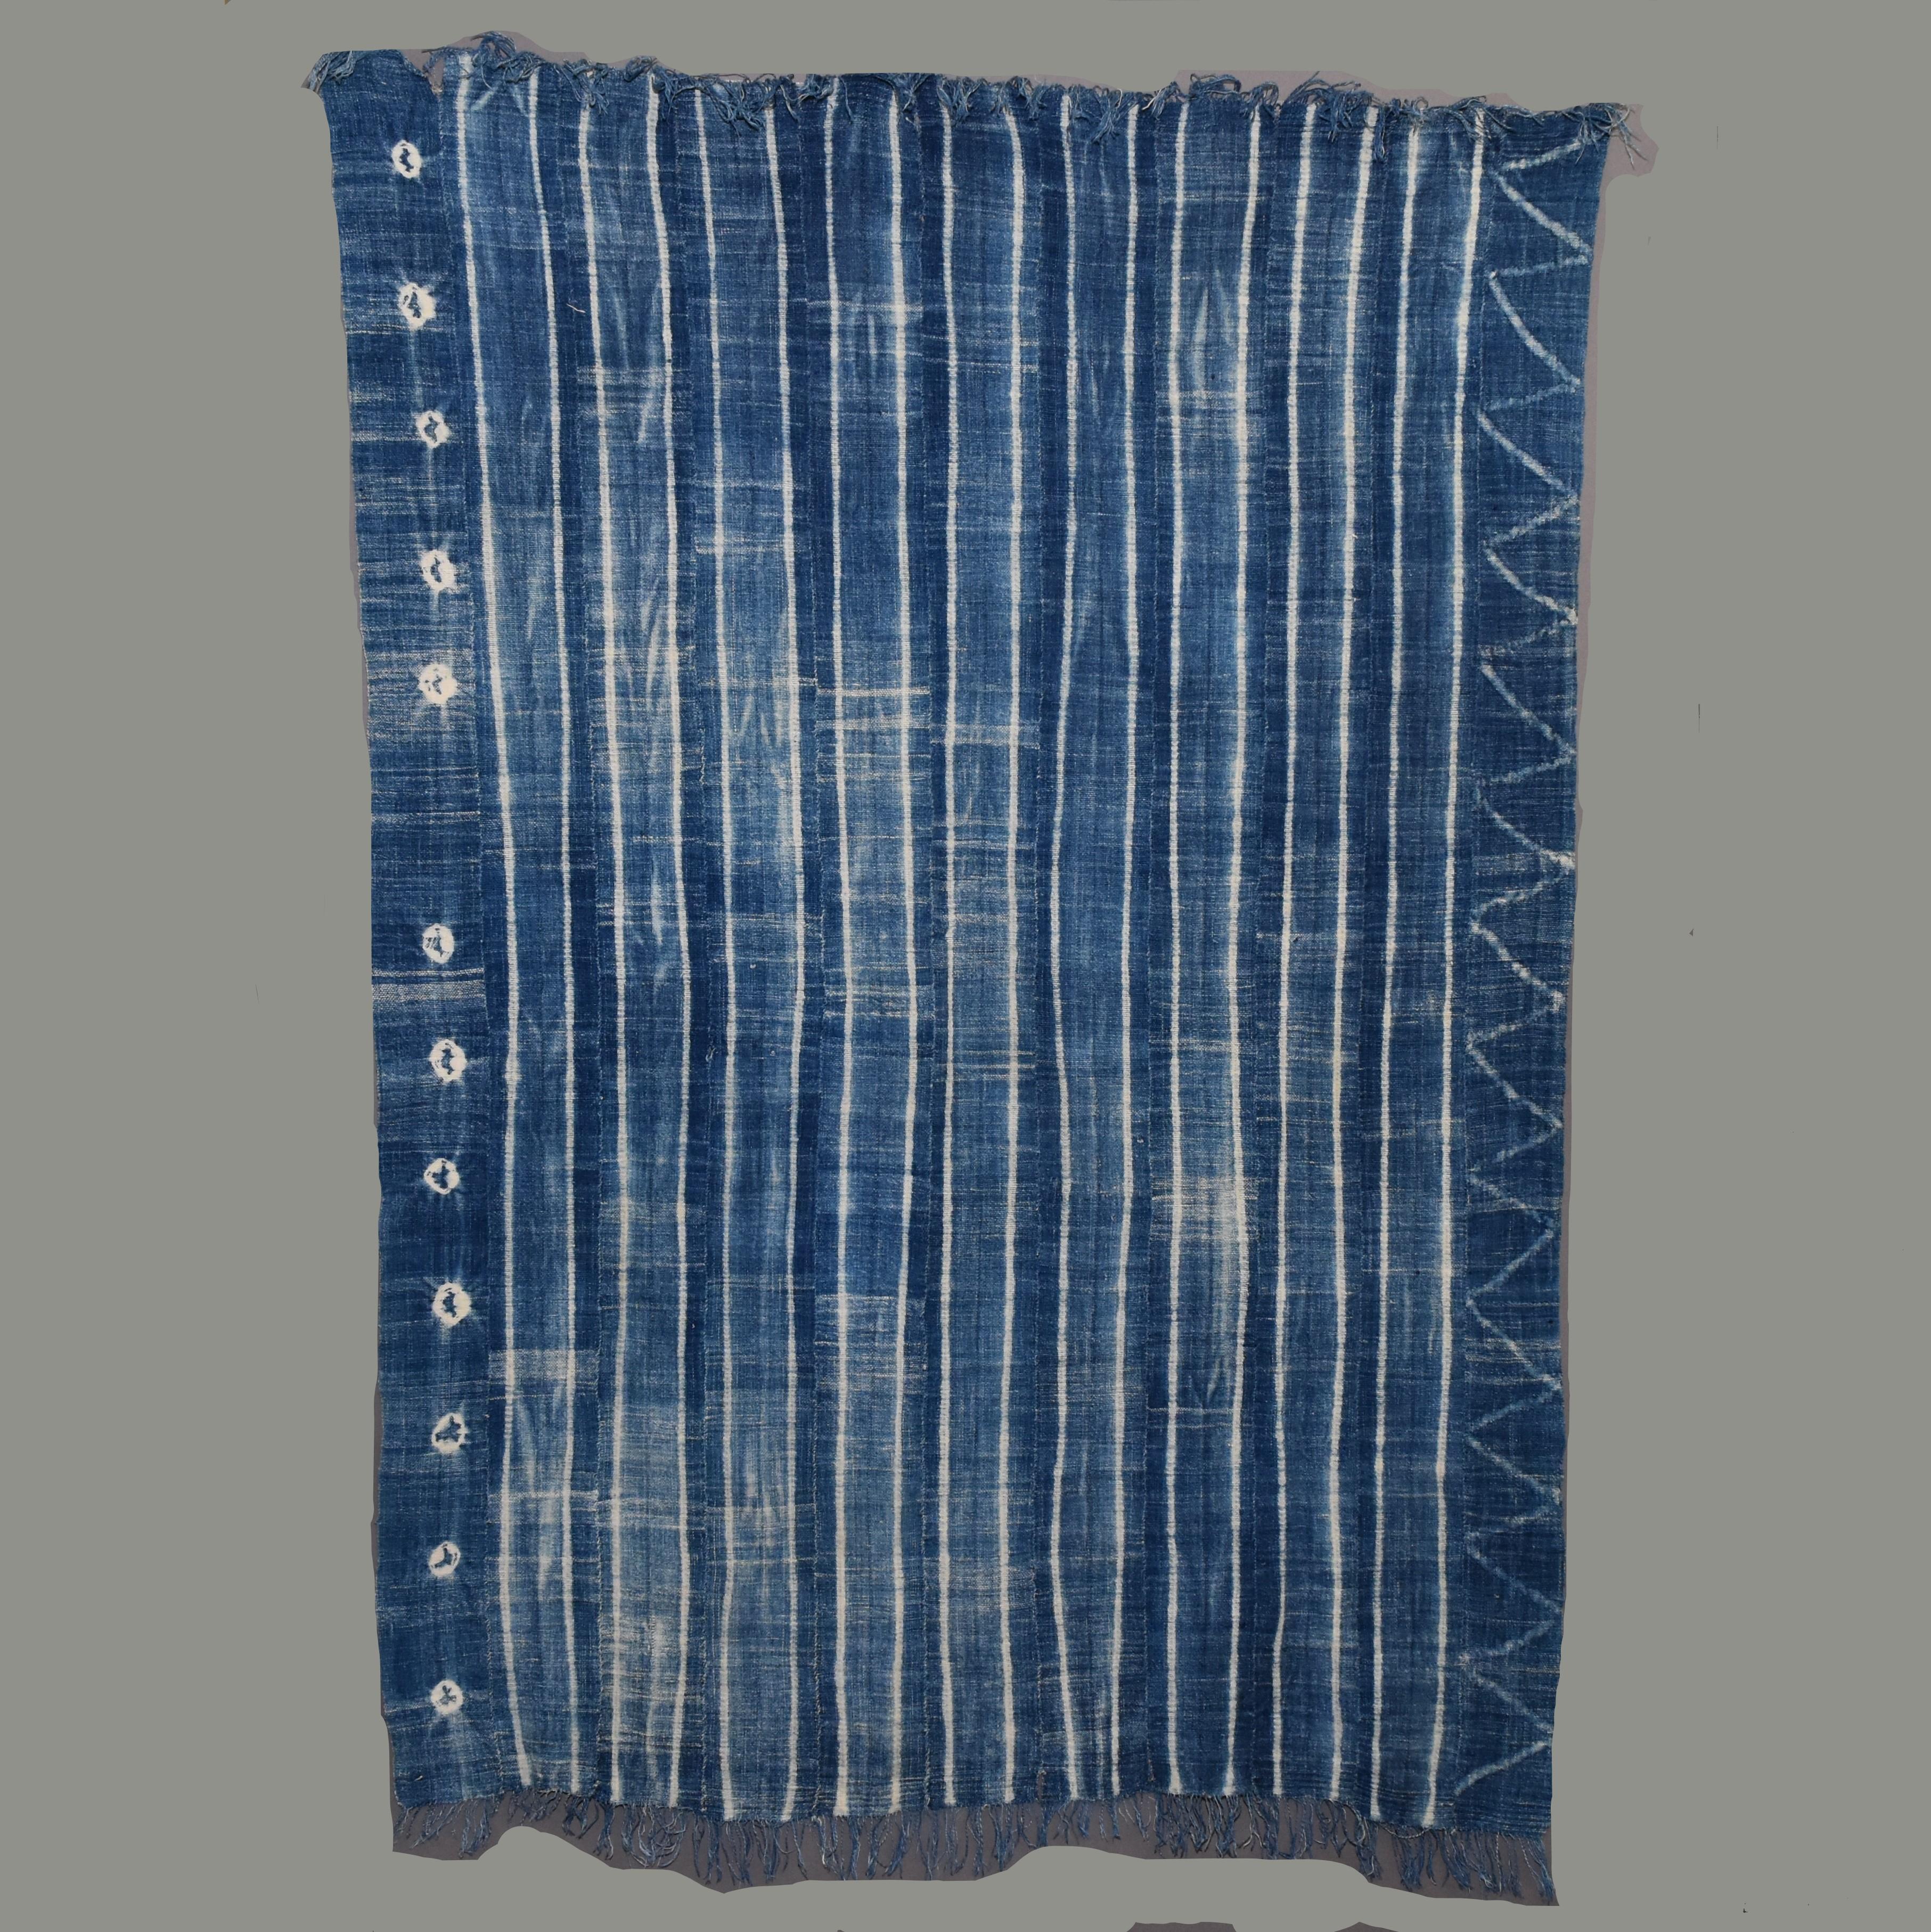 A GENTLE MOSSI CLOTH FROM BURKINA FASO ( No 684 )